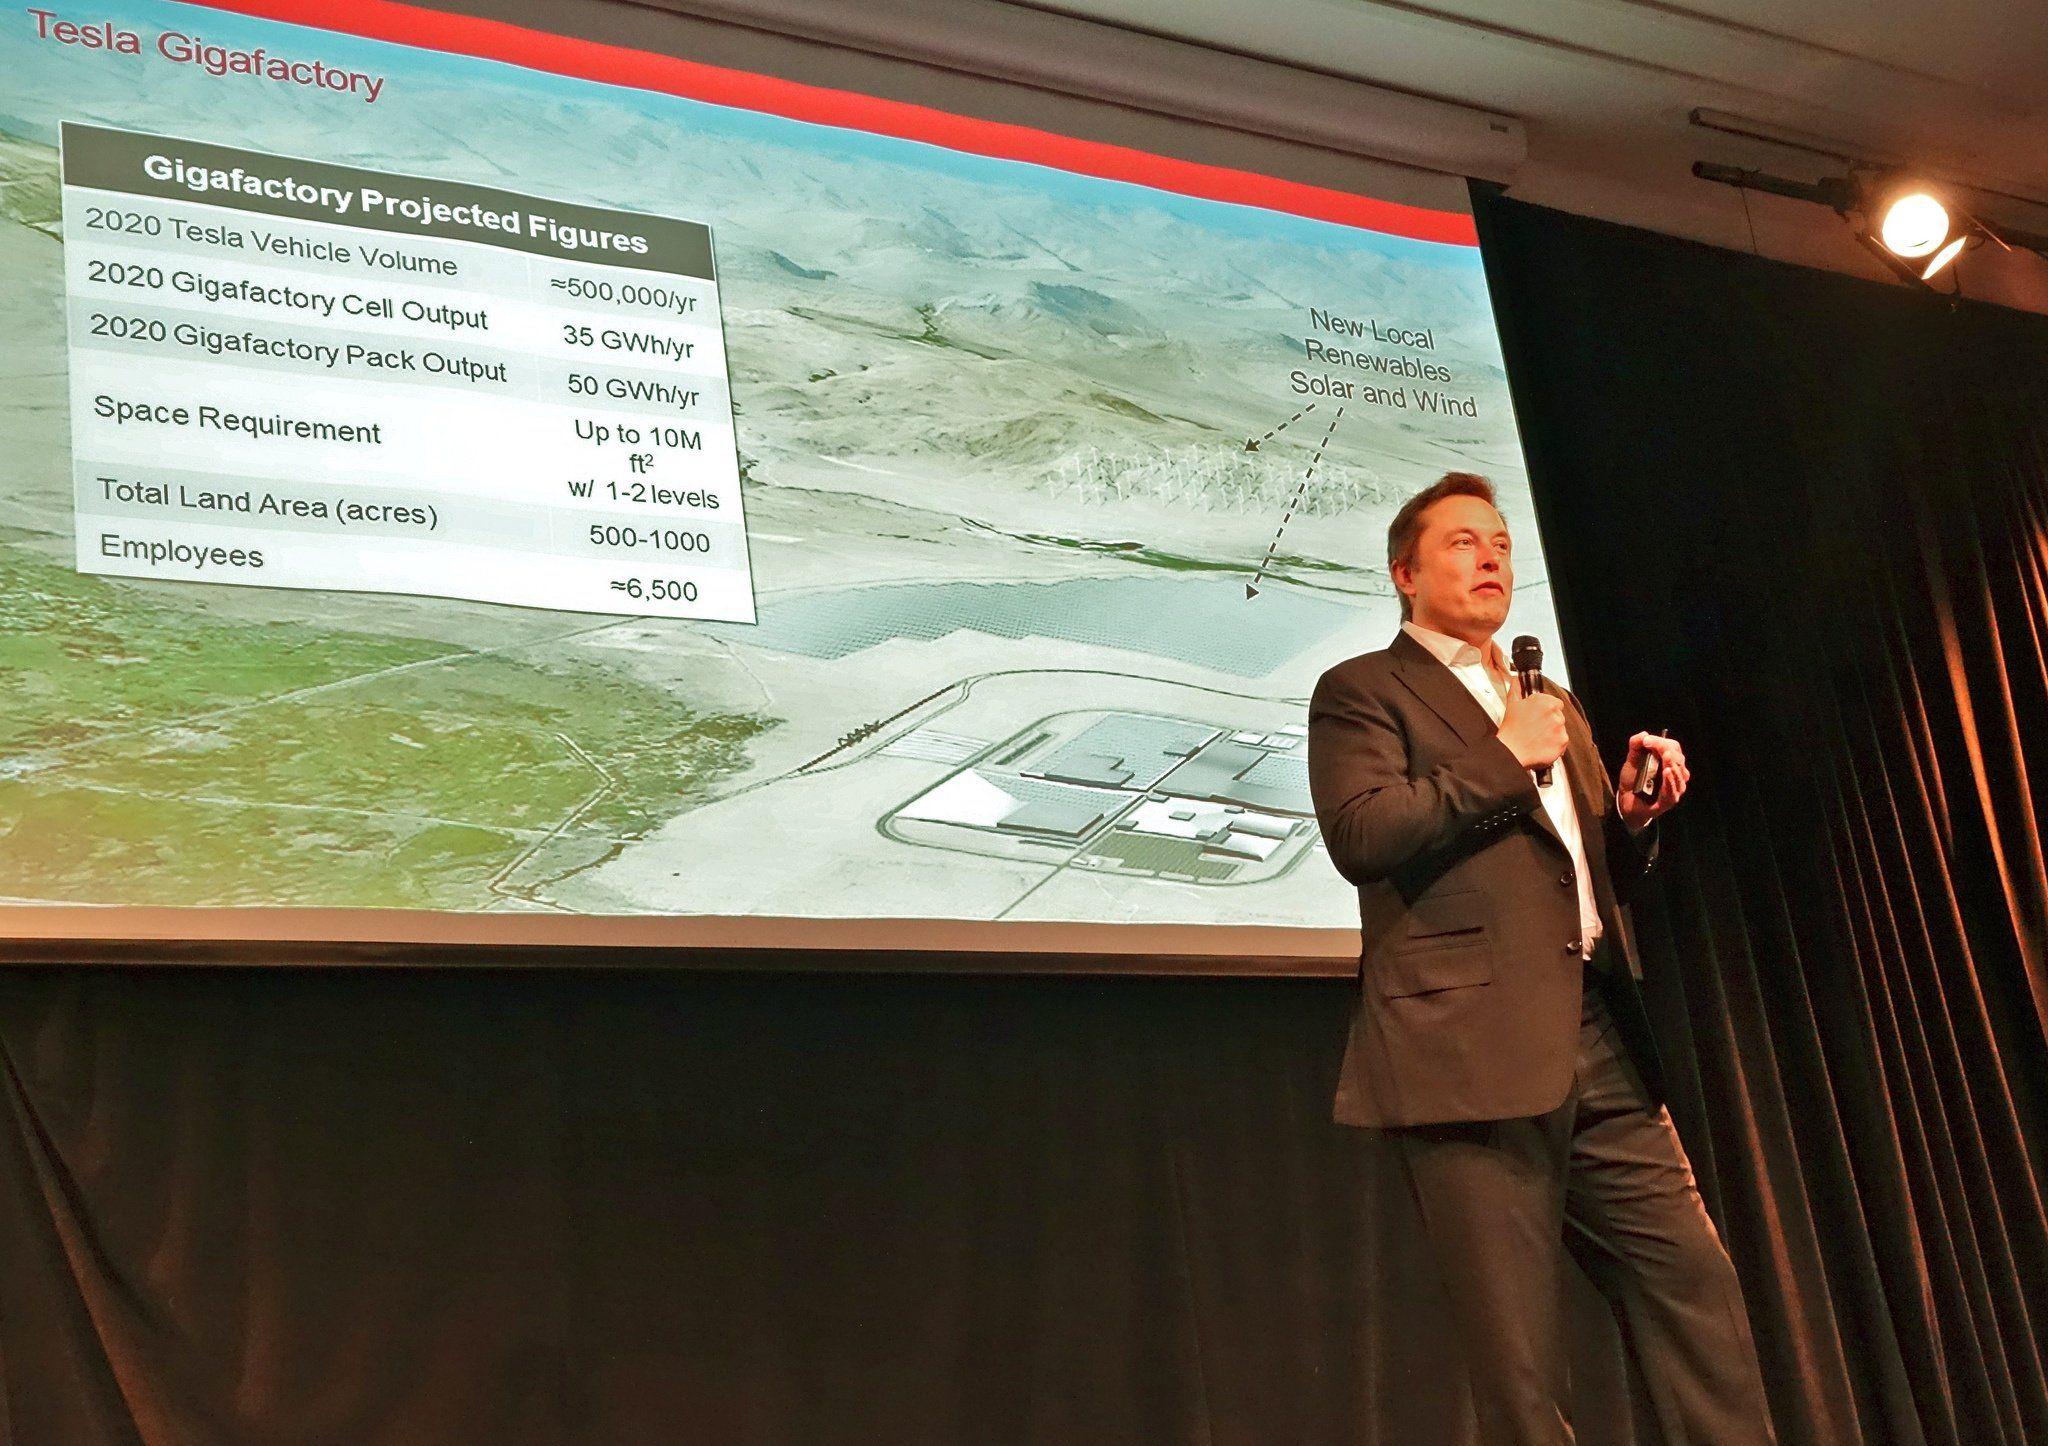 The Company S 70 Megawatt Solar Array Is Crucial To Its Goal Of Reaching Net Zero Energy Status For The Facility Solar Tesla Solar Farm